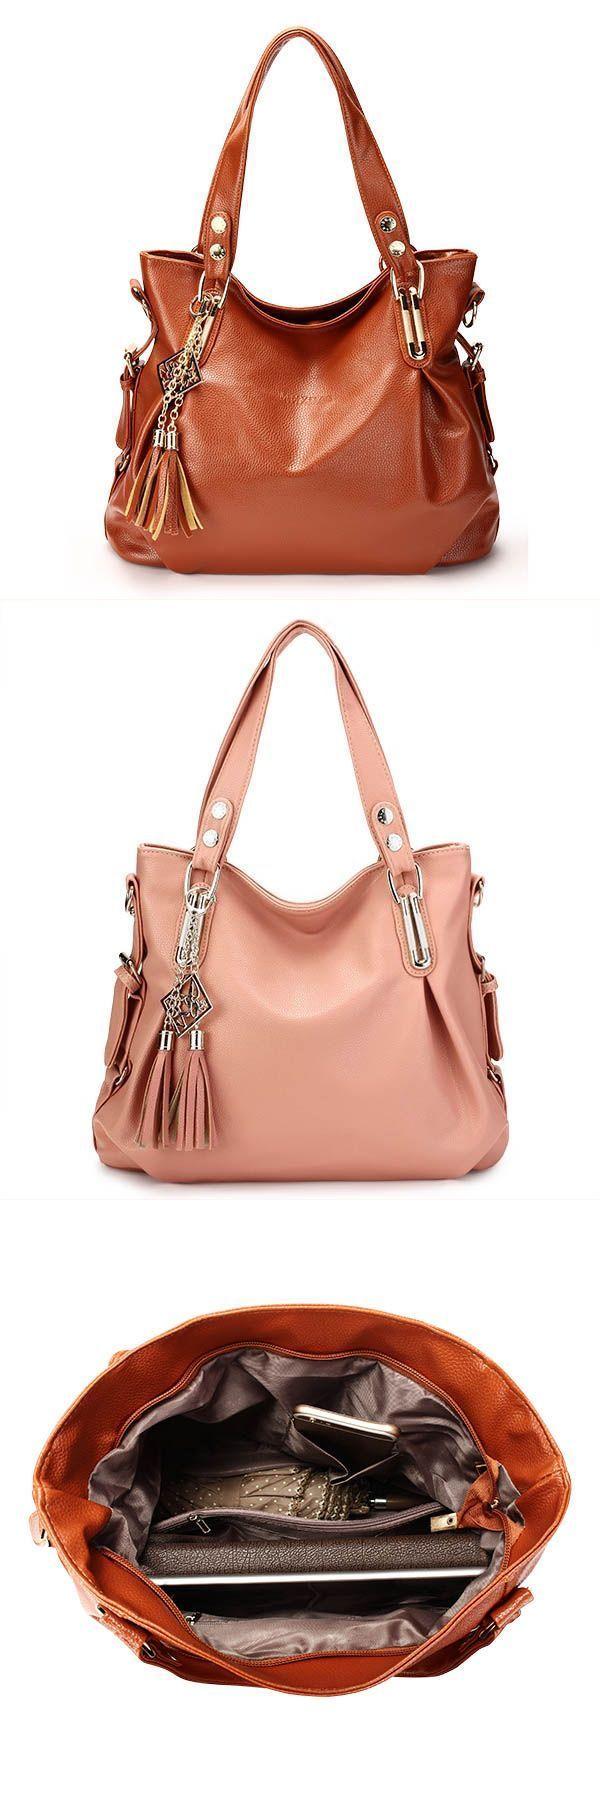 Women retro tassel handbags casual shoulder bags crossbody bags handbags 4  less  3  section 36cf801b62